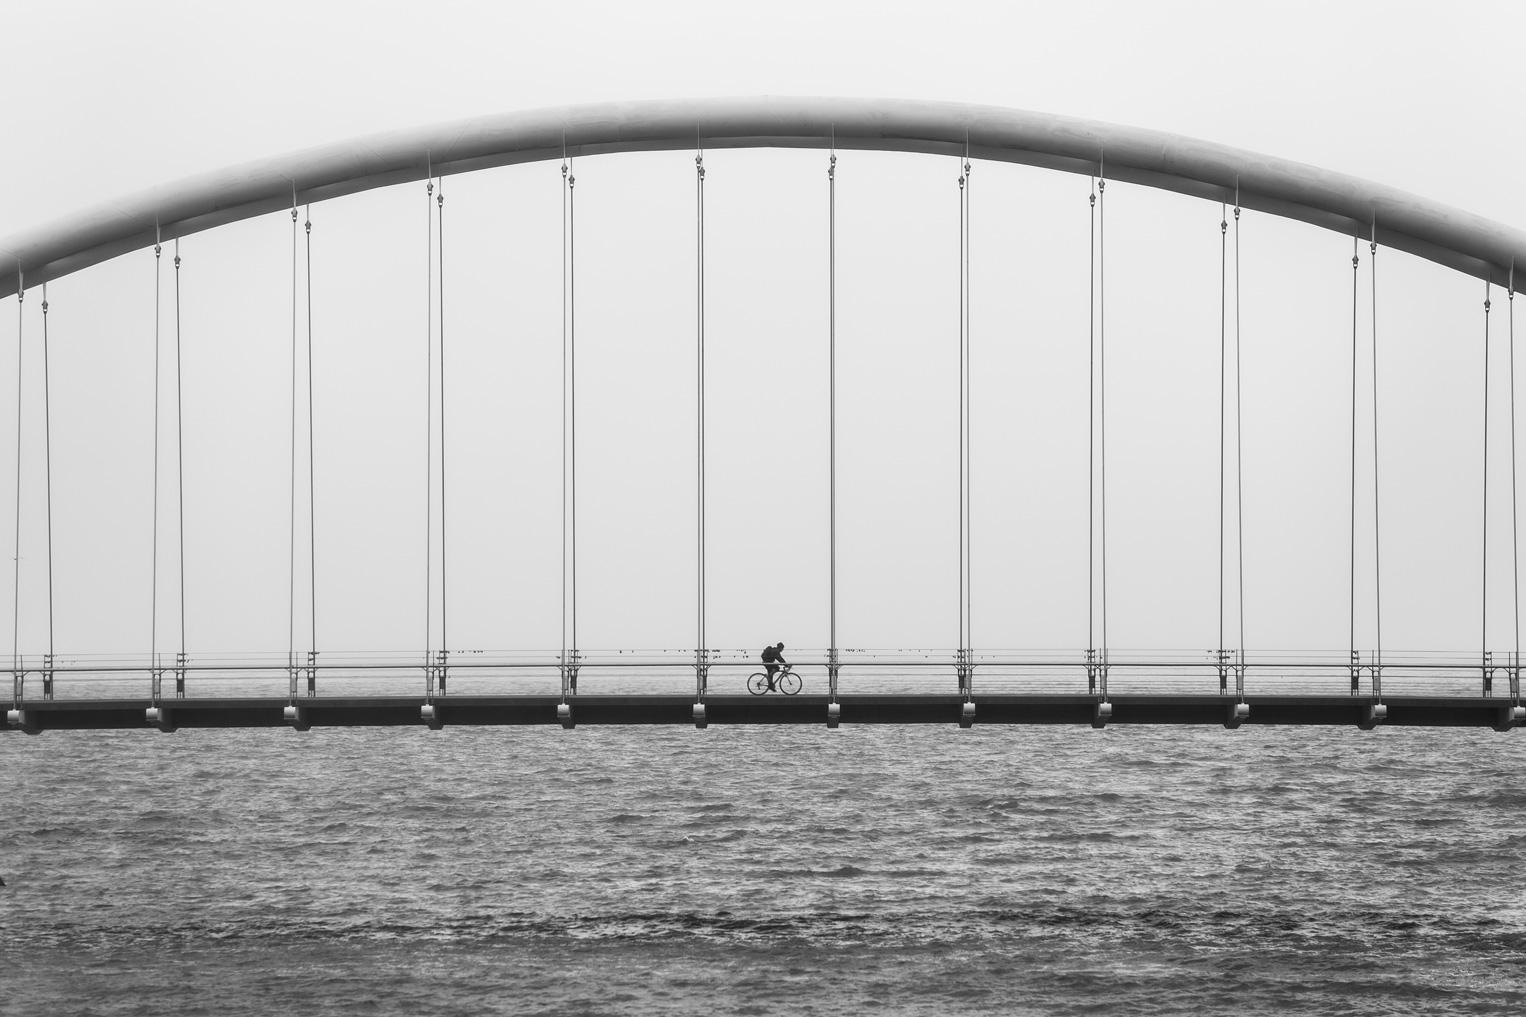 future planning thinking ahead planning ahead bridge bike uncertainty